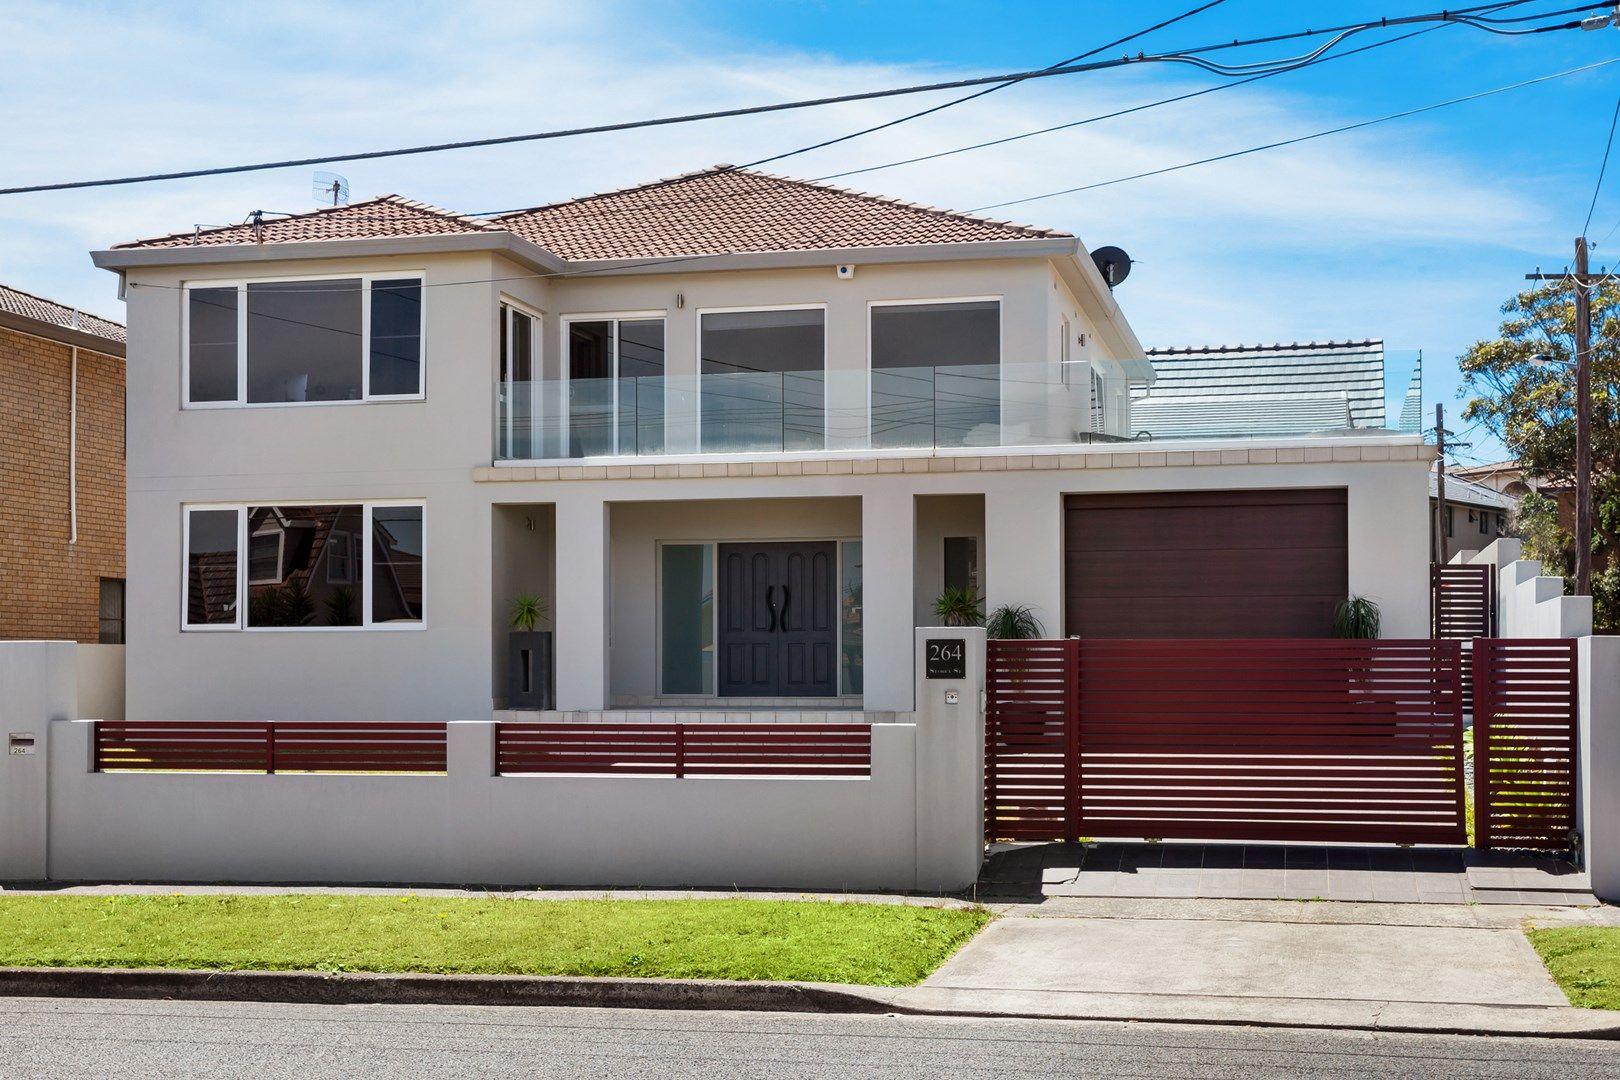 264 Storey Street, Maroubra NSW 2035, Image 0